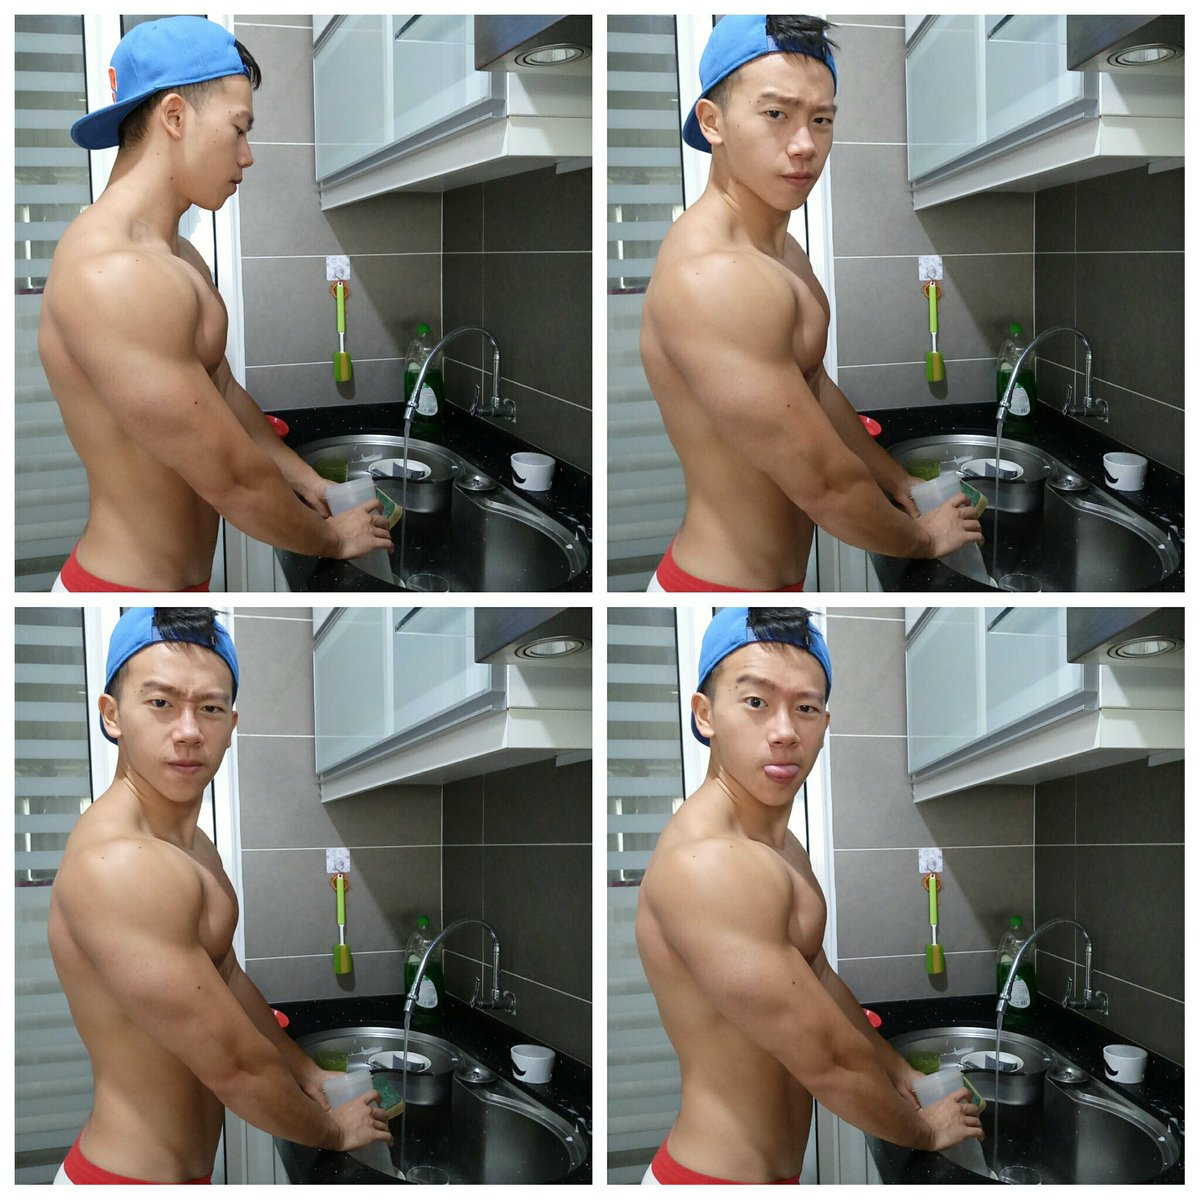 Gay hk so Homosexuality in